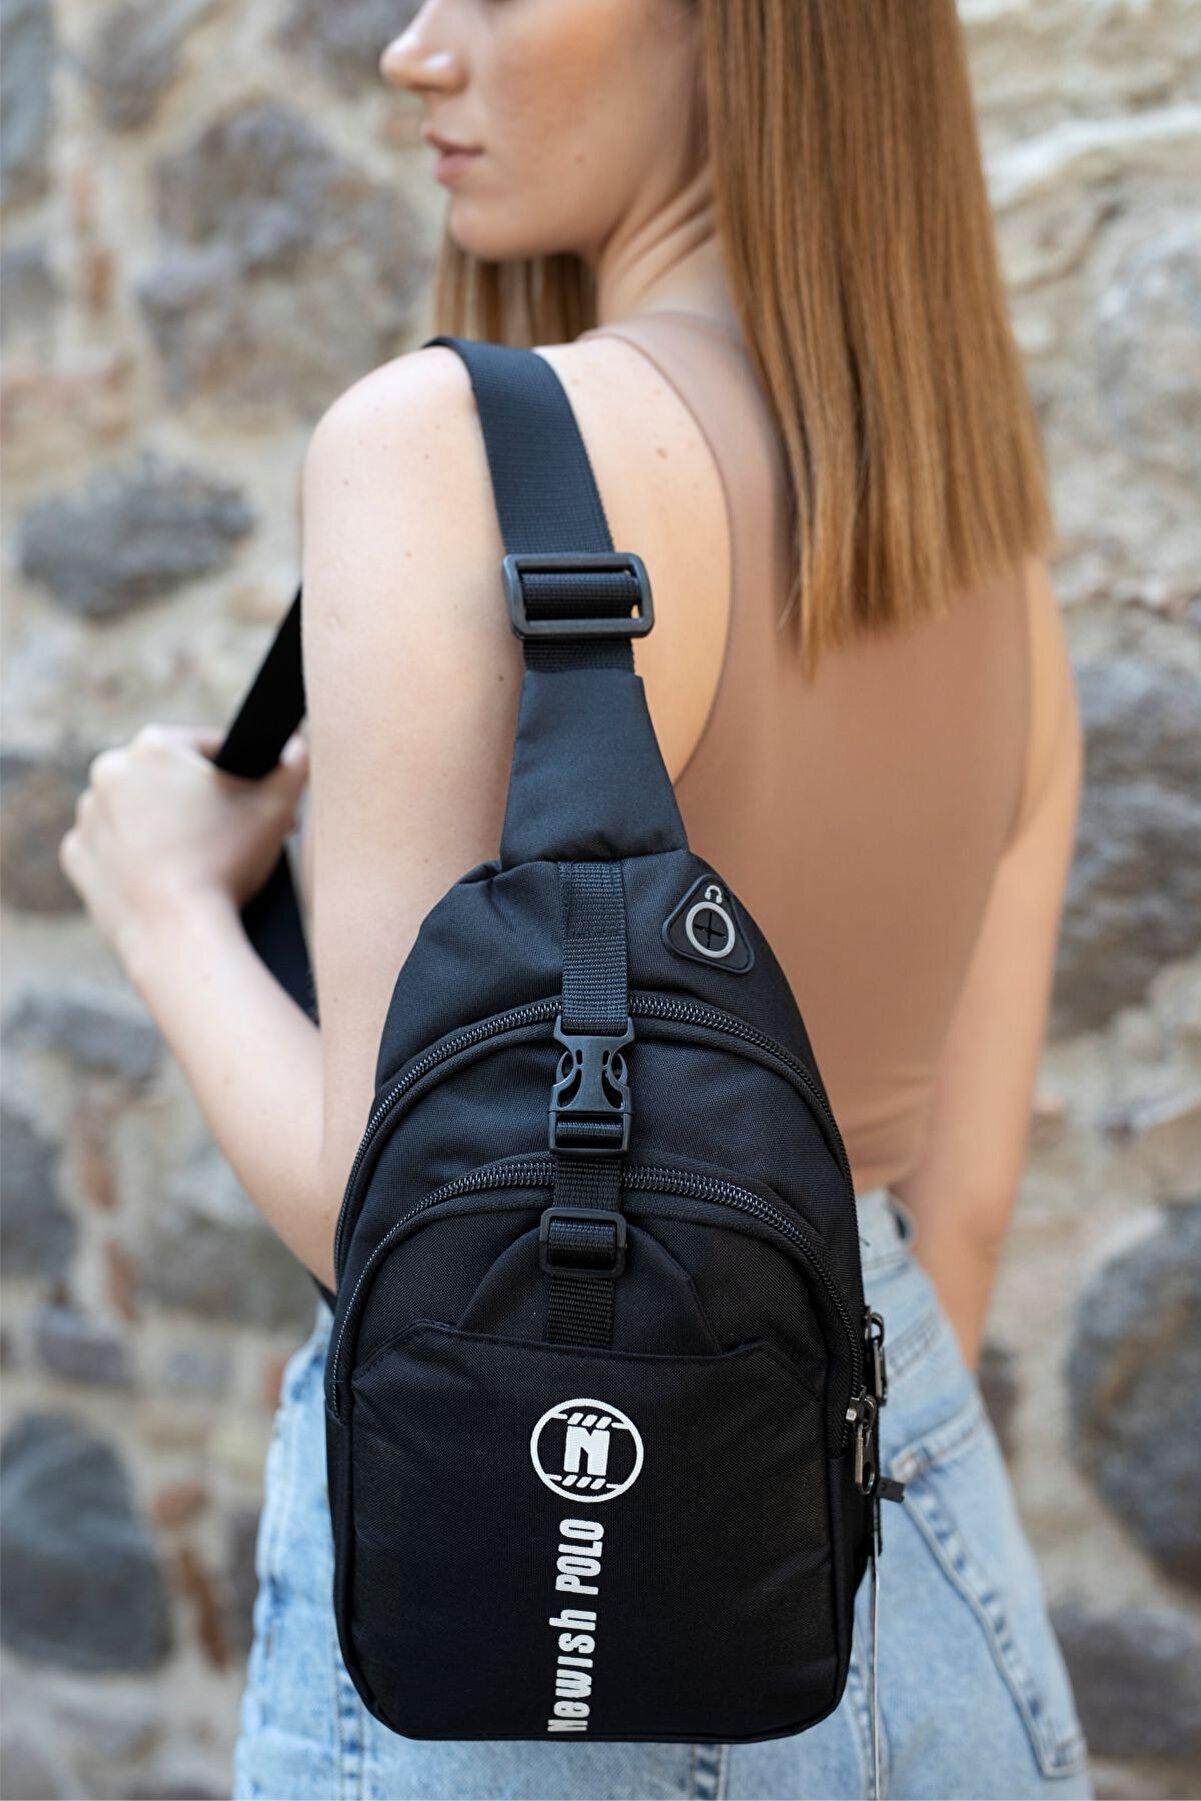 Newish Polo Newish Bodybag